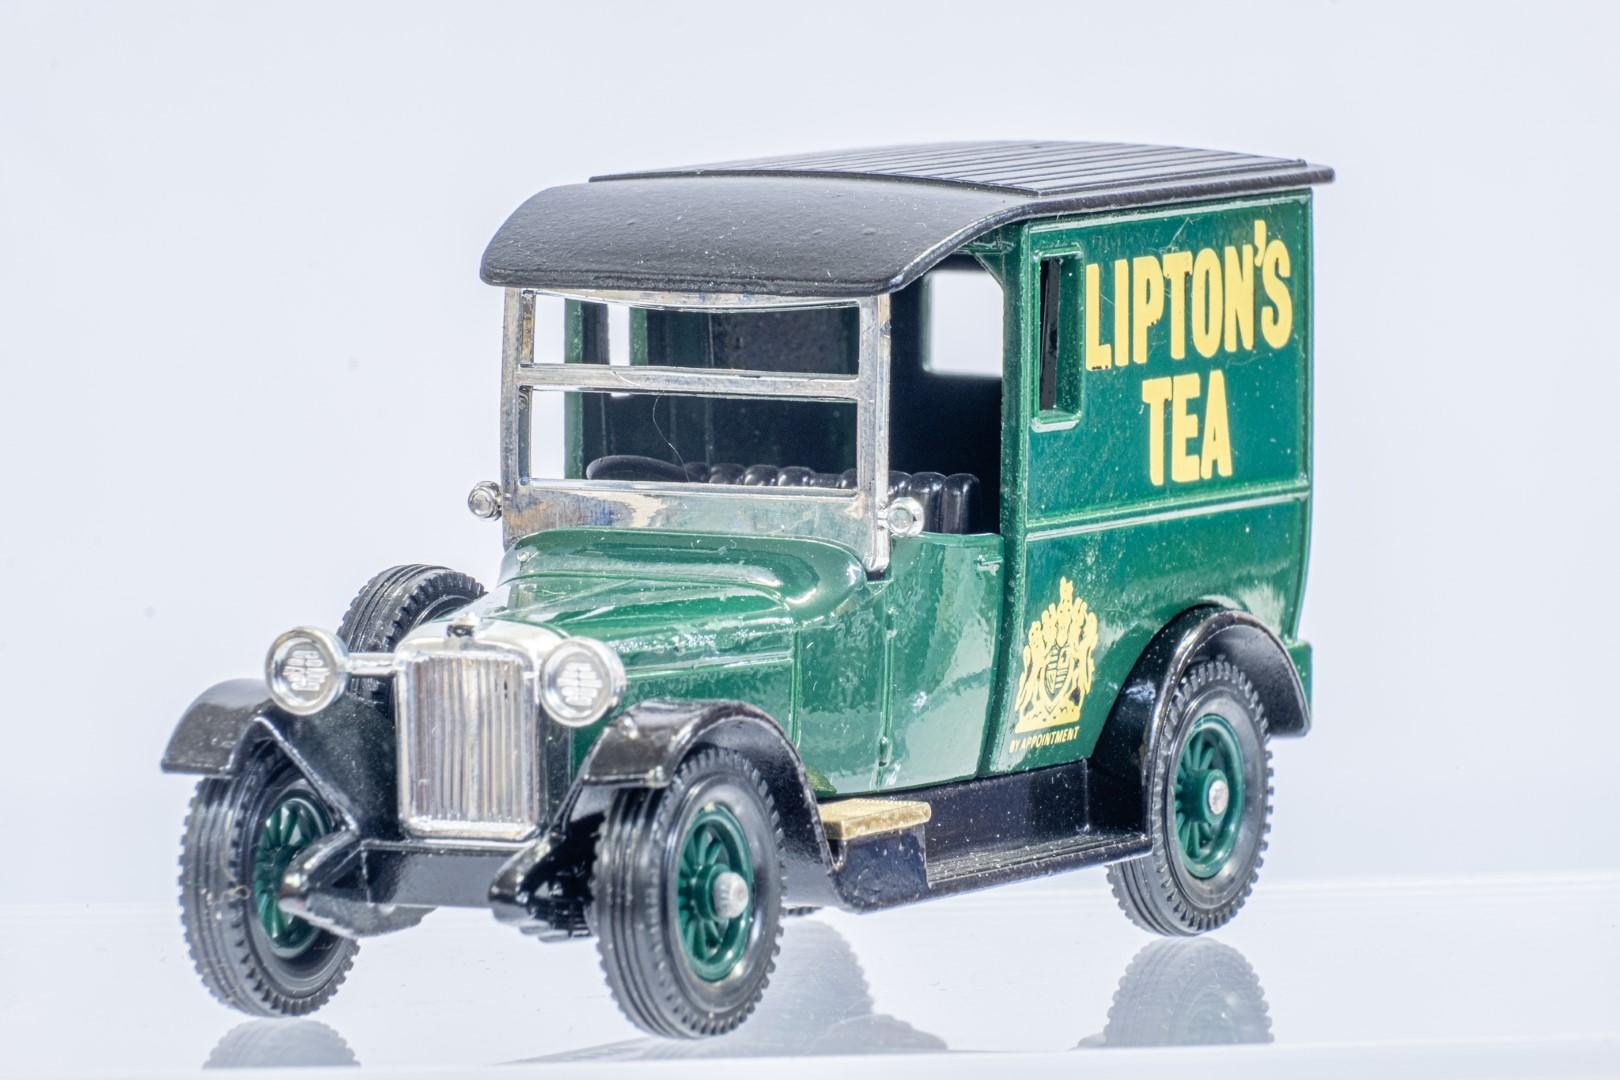 Matchbox 1927 Talbot Van Y-5 - Liptions Tea - Rare - Image 6 of 9